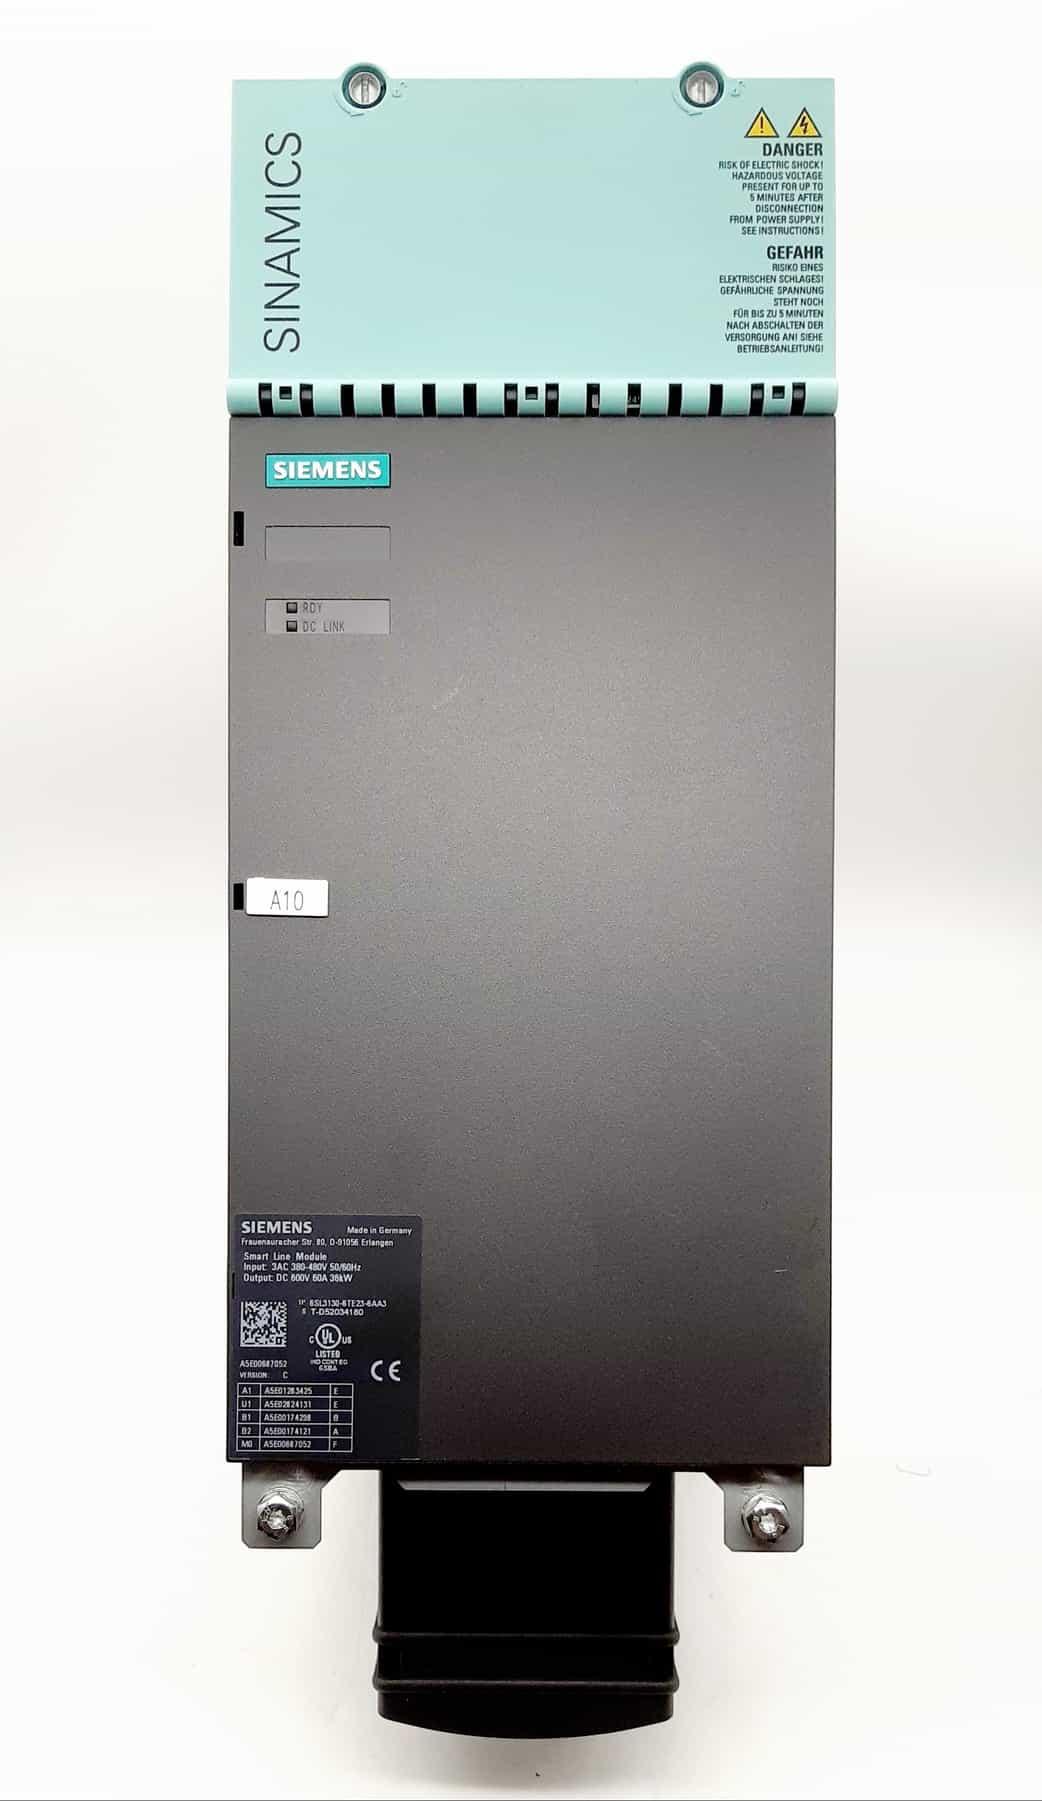 6SL3130-6TE23-6AA3 36KW - NOVA   FONTE SINAMICS SMART LINE   SIEMENS